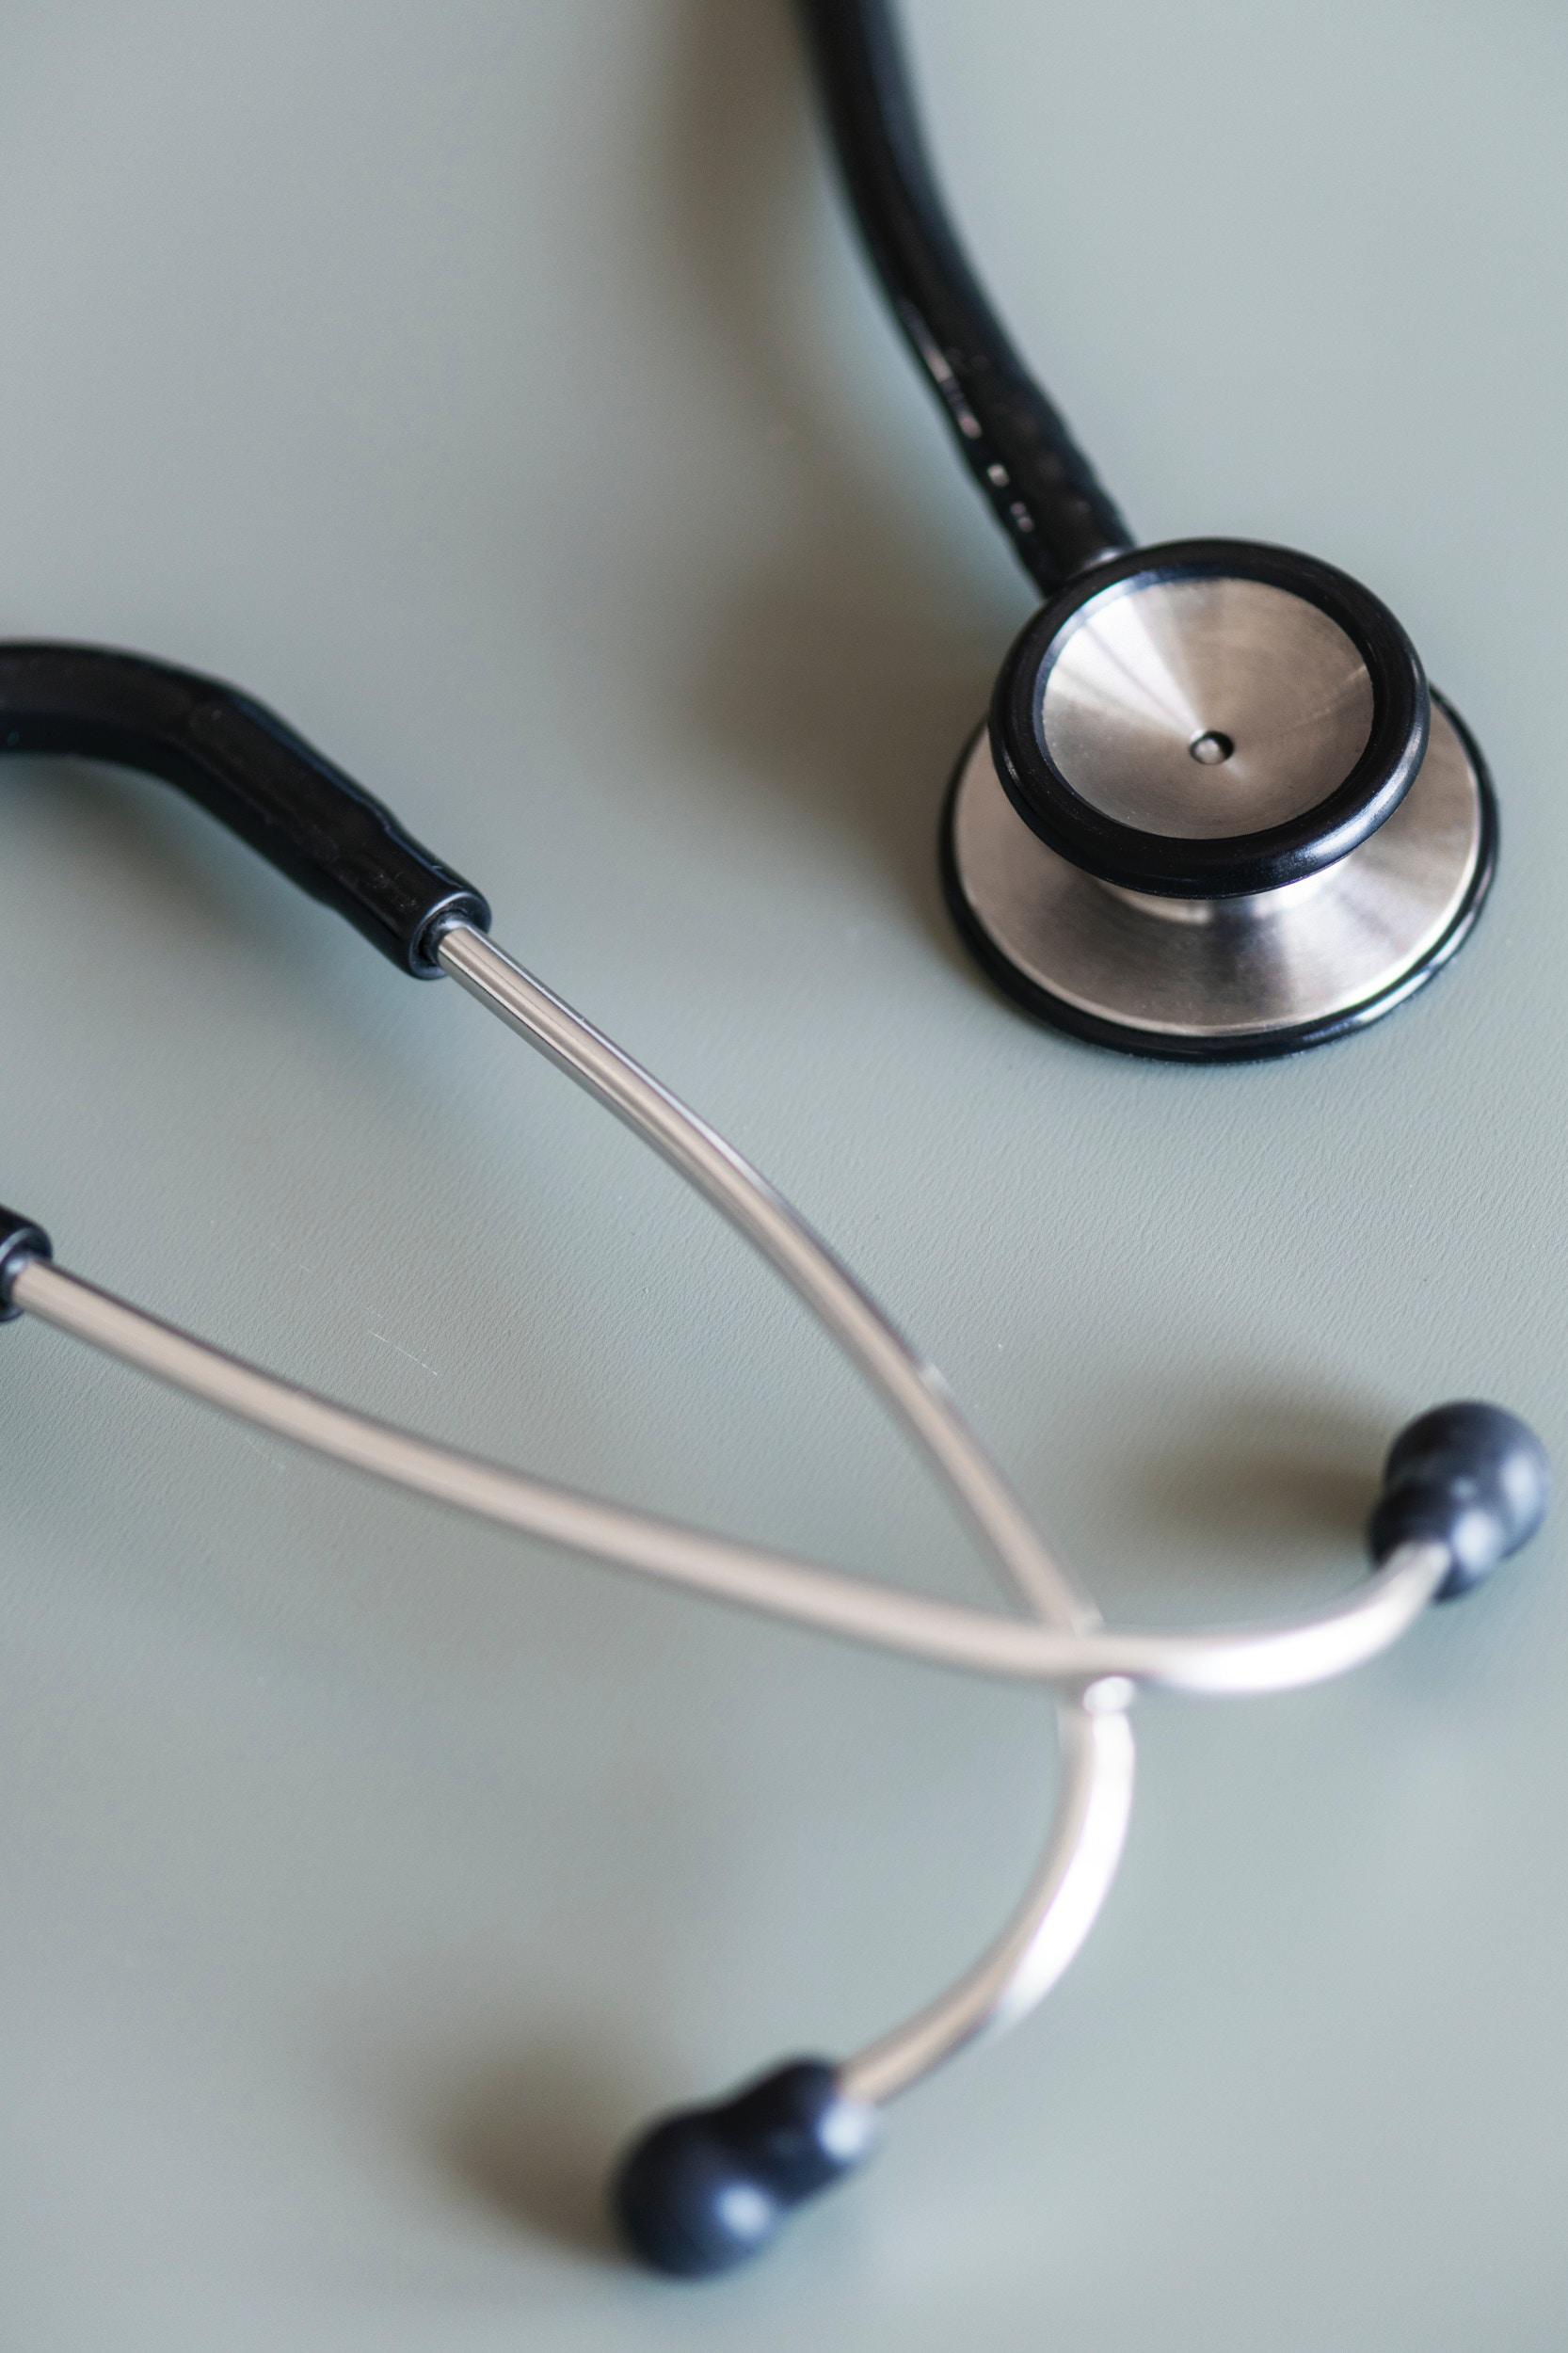 SOUTHLAKE MEDICAL - Medical Center